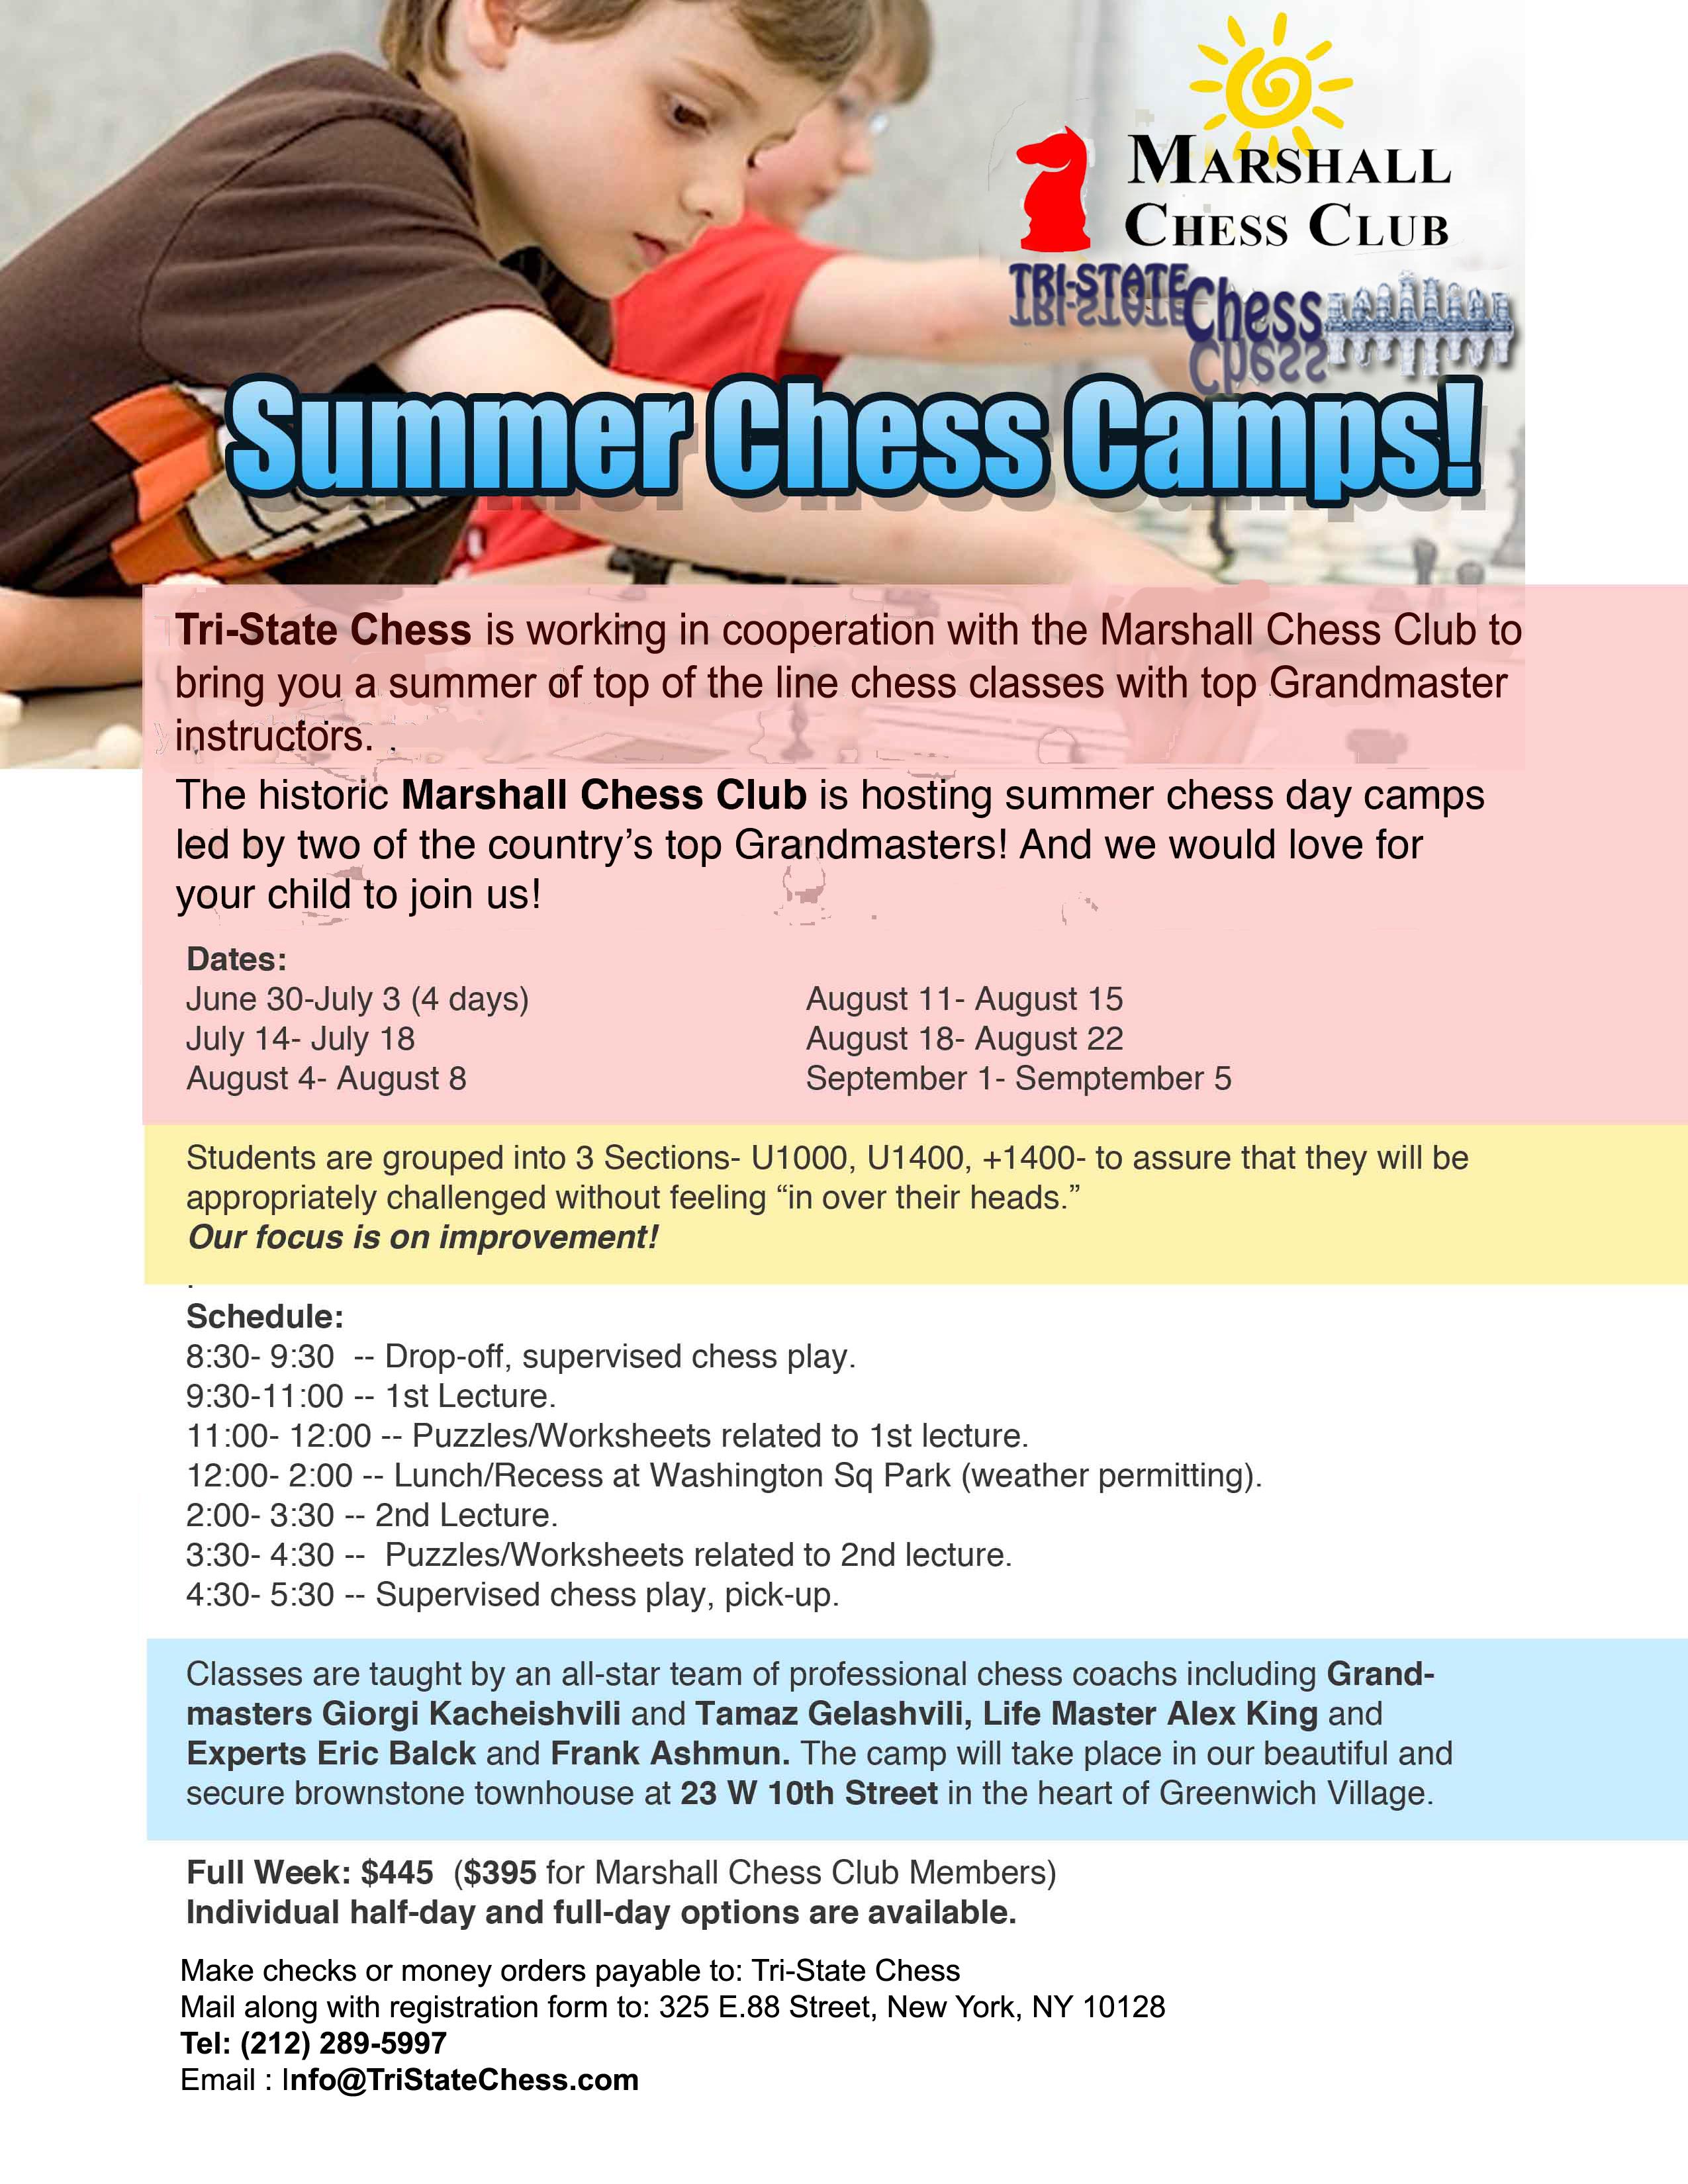 Marshall Camp – New York, Chess Programs and Equipment | Tri